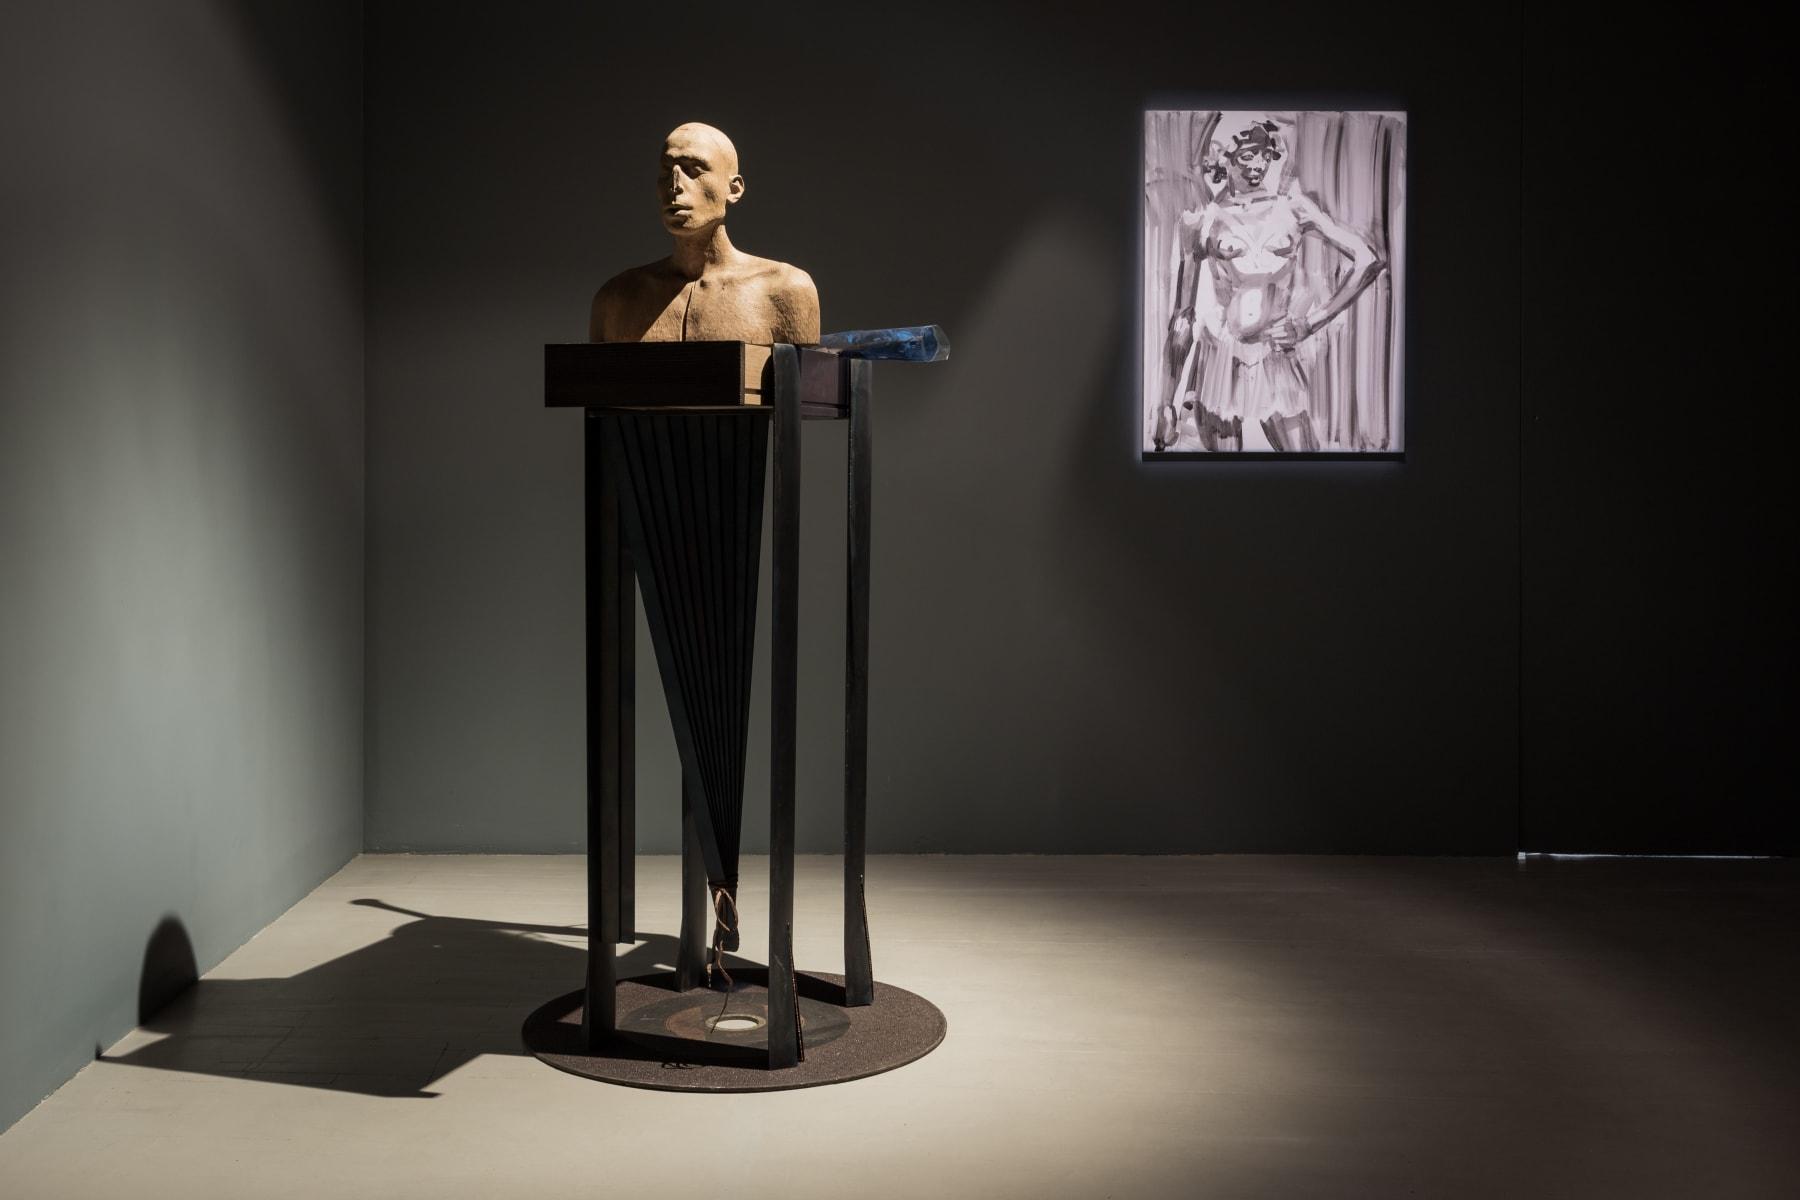 Galerija Vartai, 2017 Vytautas Viržbickas installation in group exhibition